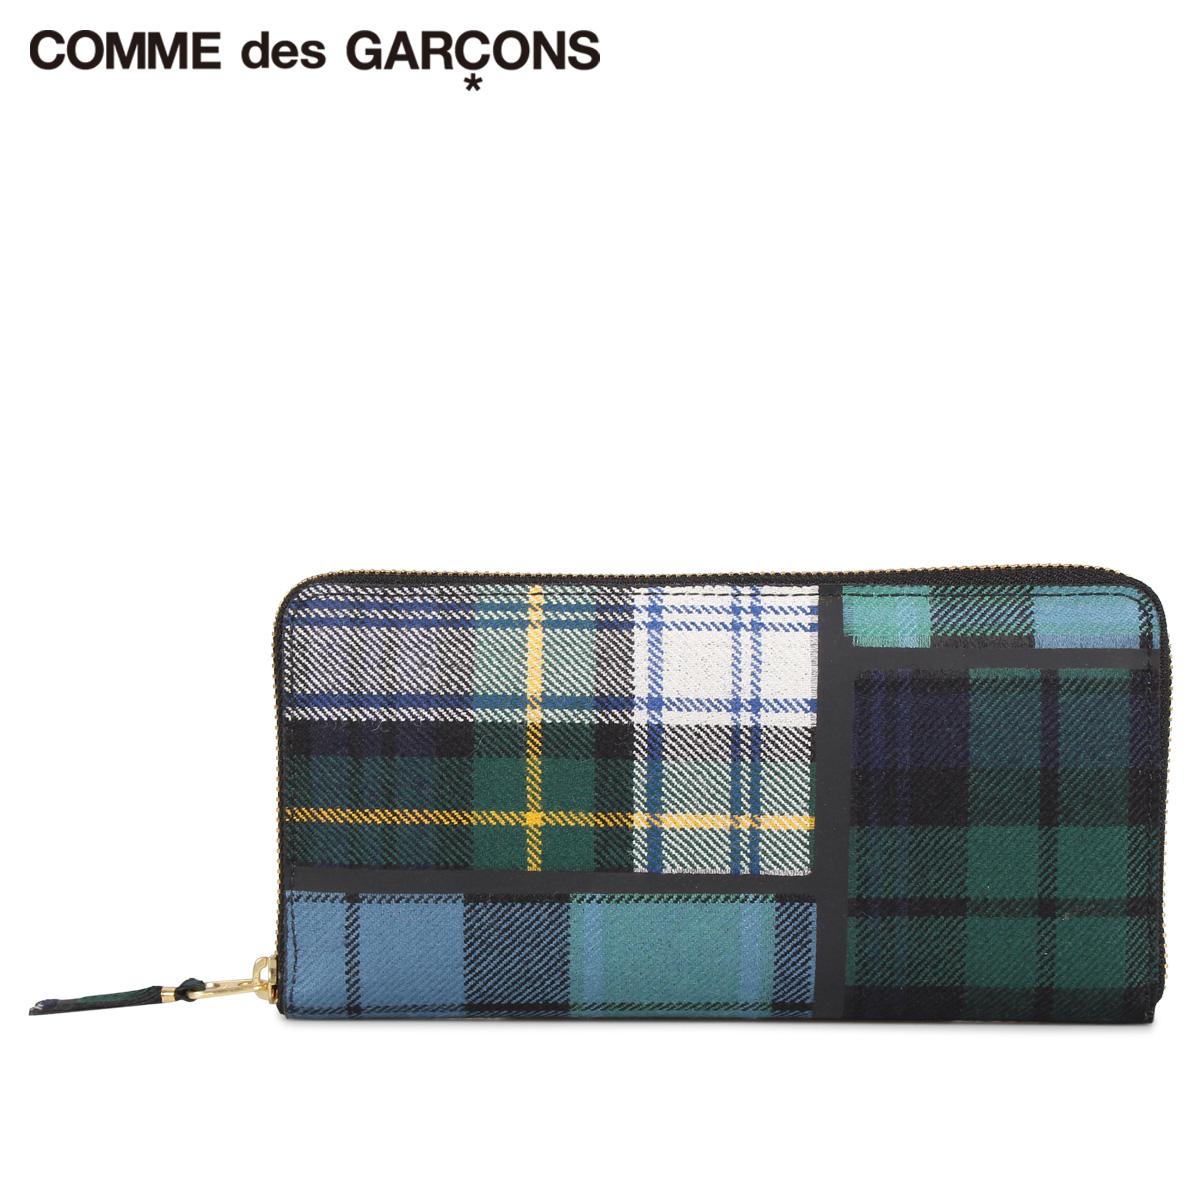 COMME des GARCONS TARTAN PATCHWORK WALLET コムデギャルソン 財布 長財布 メンズ レディース ラウンドファスナー 本革 タータンチェック グリーン SA0110TP [10/10 新入荷]